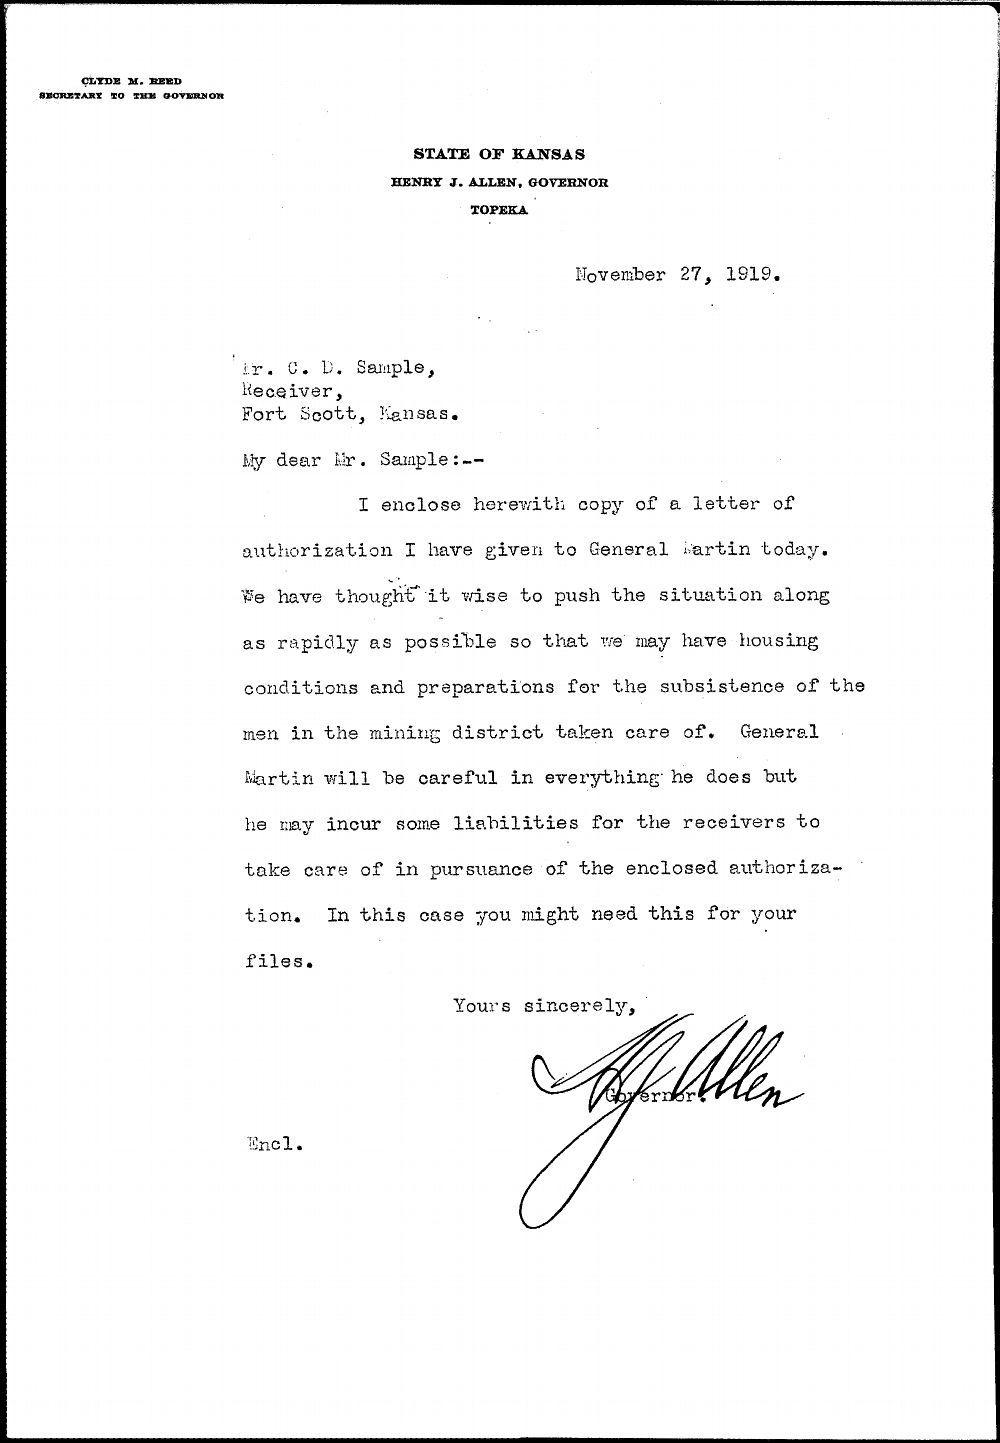 Governor Henry Allen to C. D. Sample